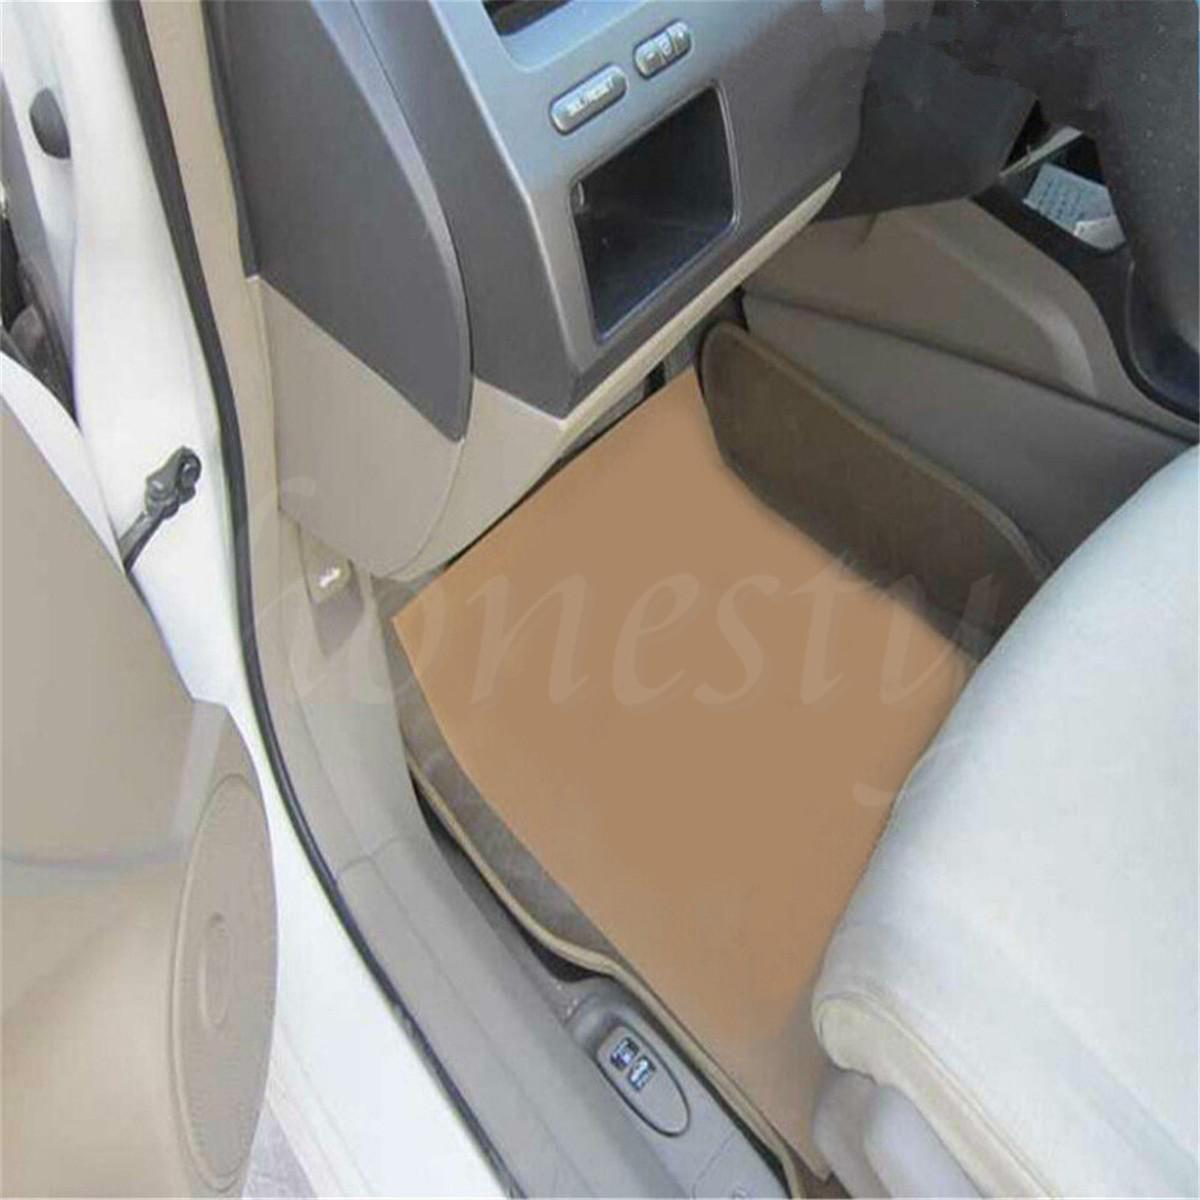 2~50pcs Universal Absorbent Kraft Paper Car Disposable